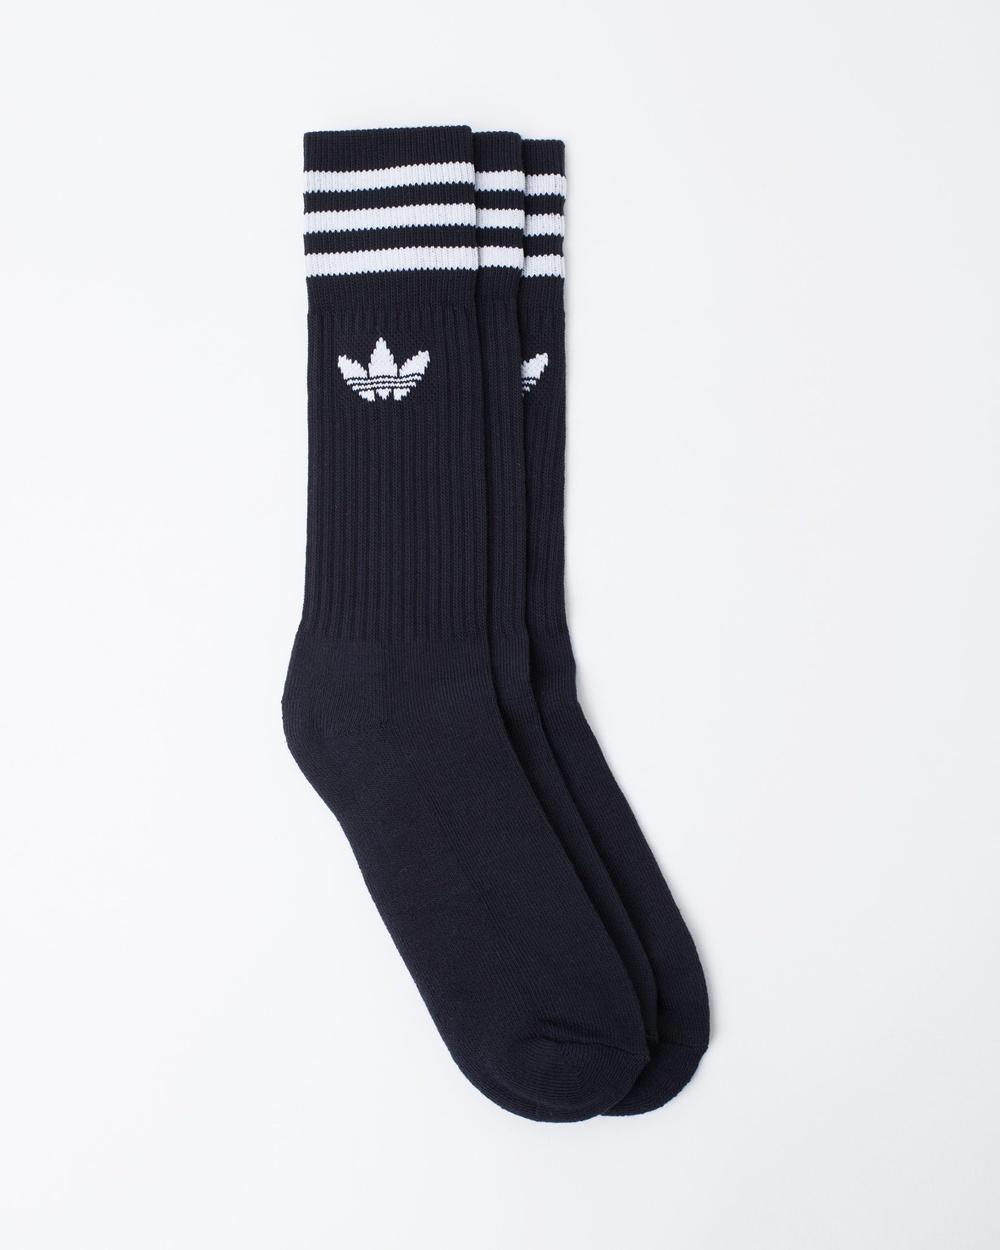 adidas Originals Solid Crew Socks 3 Pack Underwear & Black White